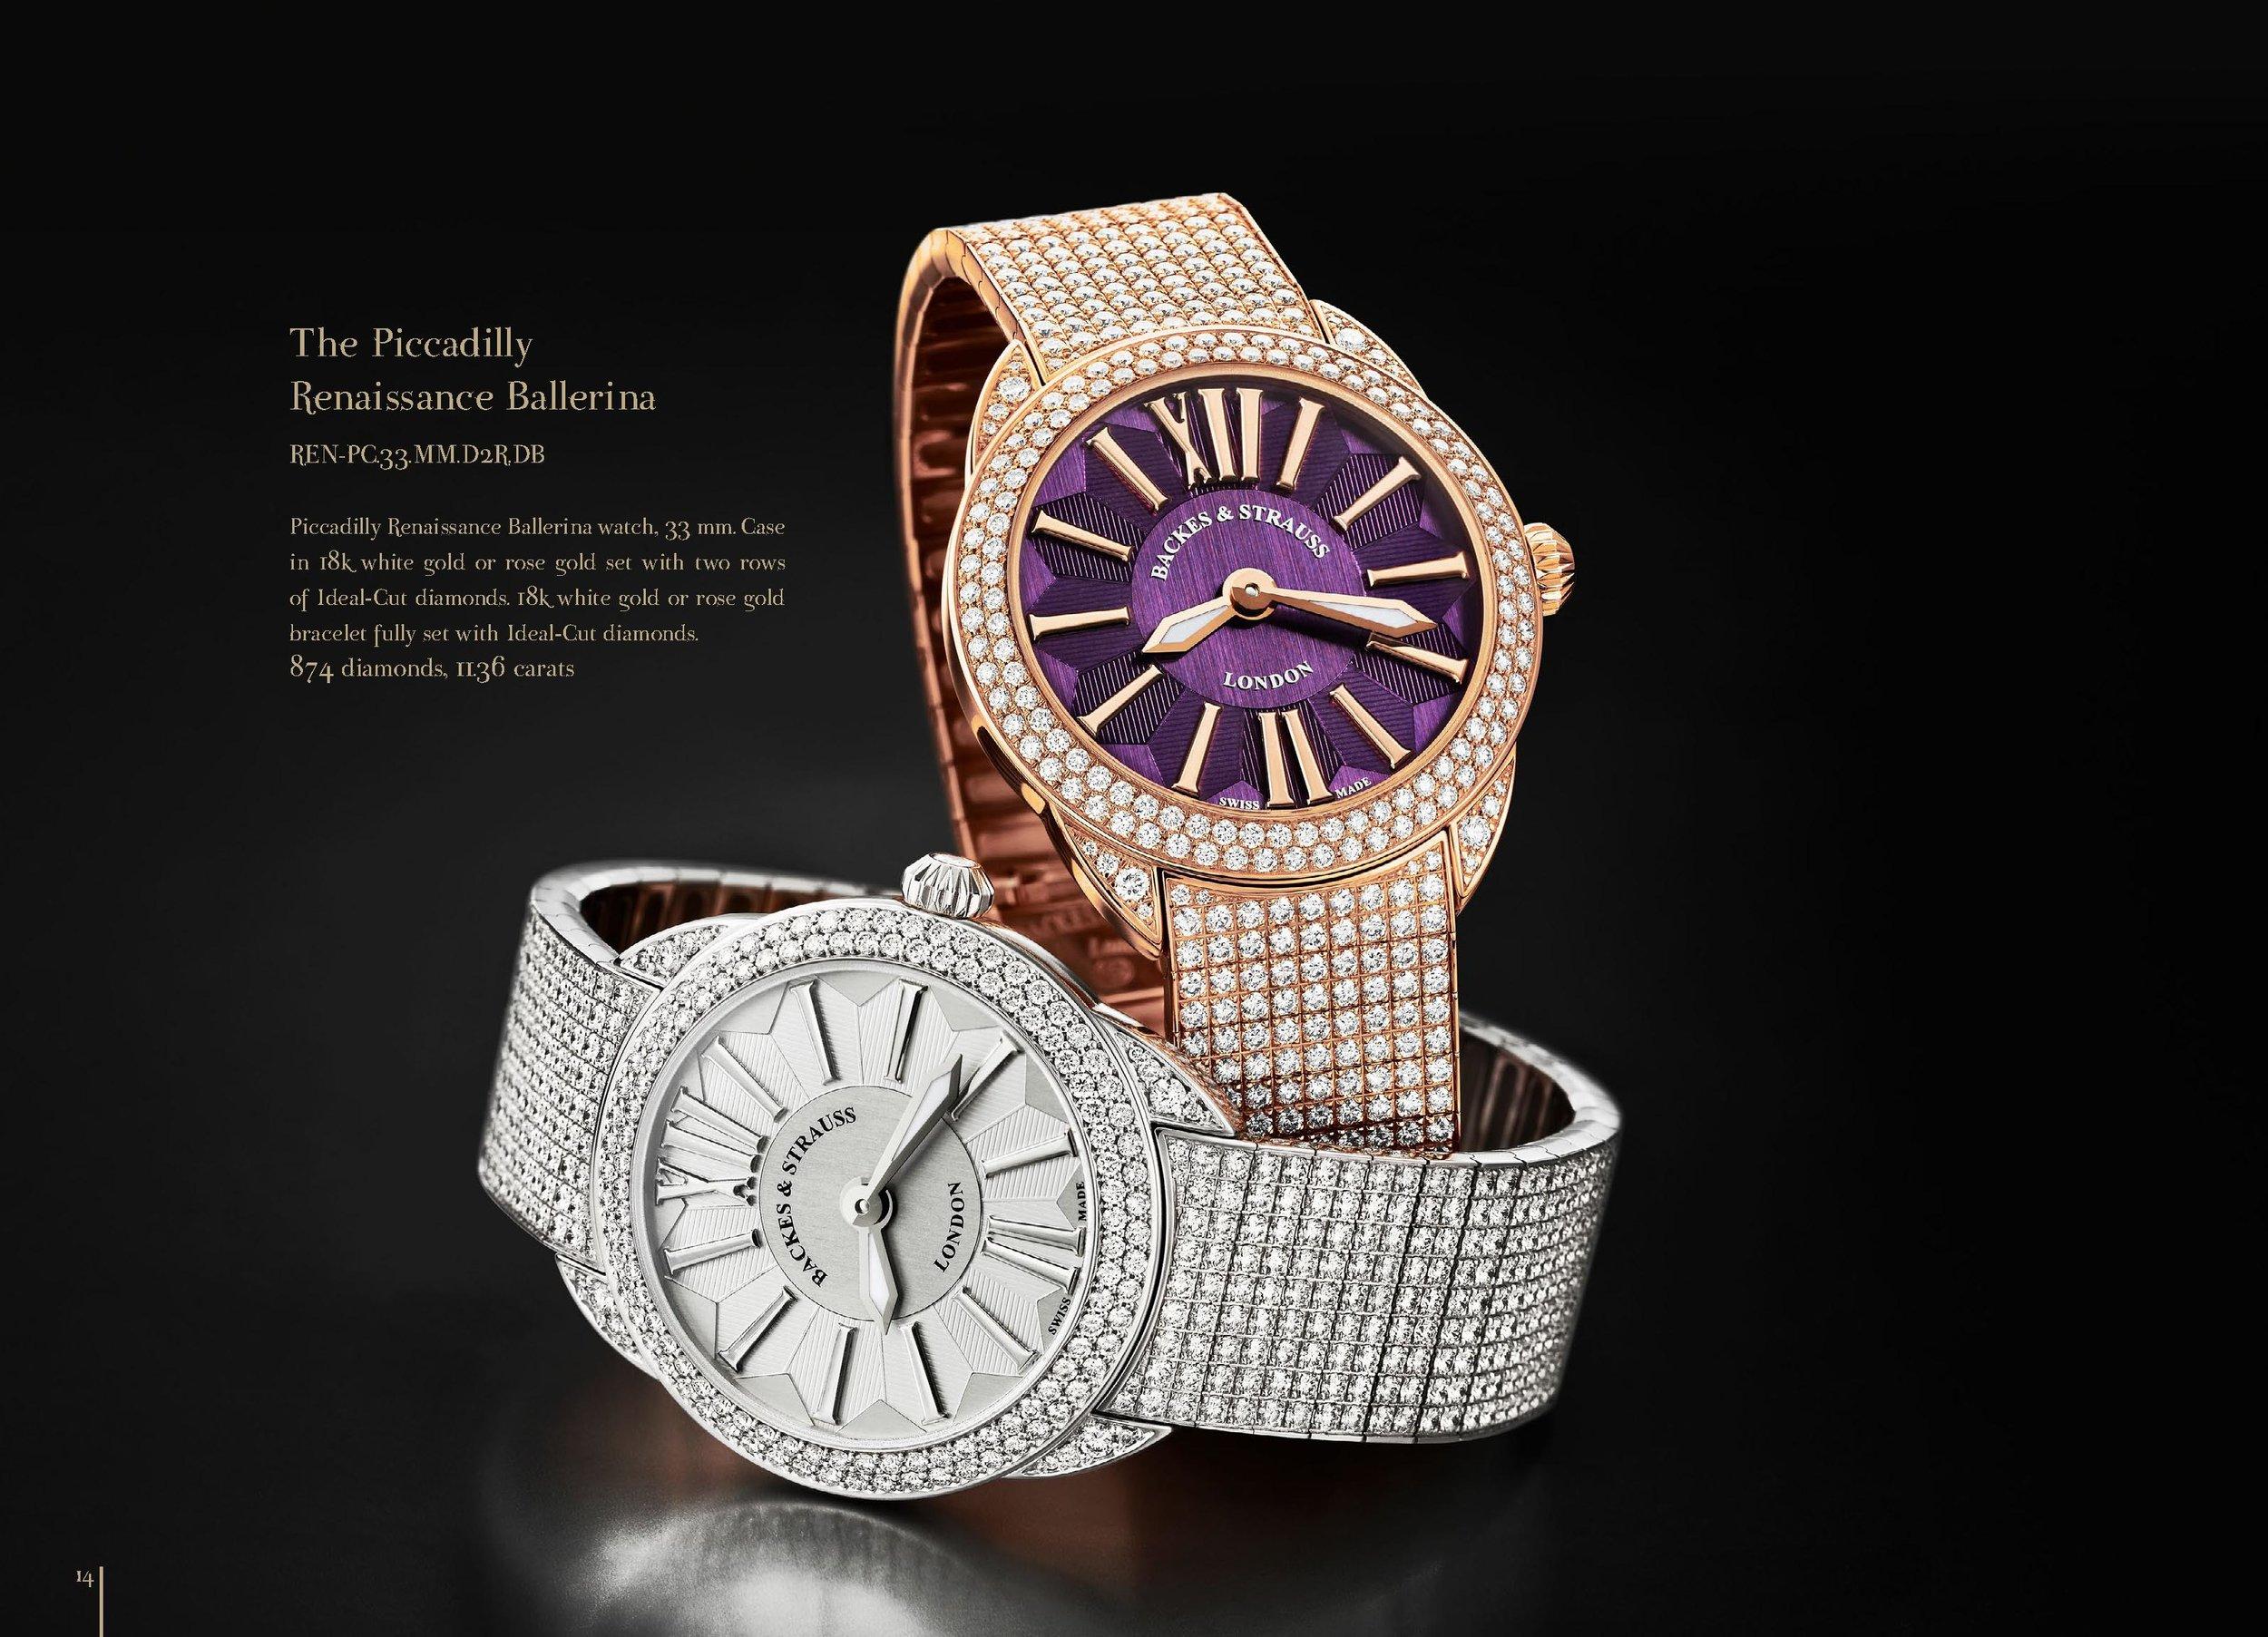 Piccadilly Renaissance Ballerina diamond watch